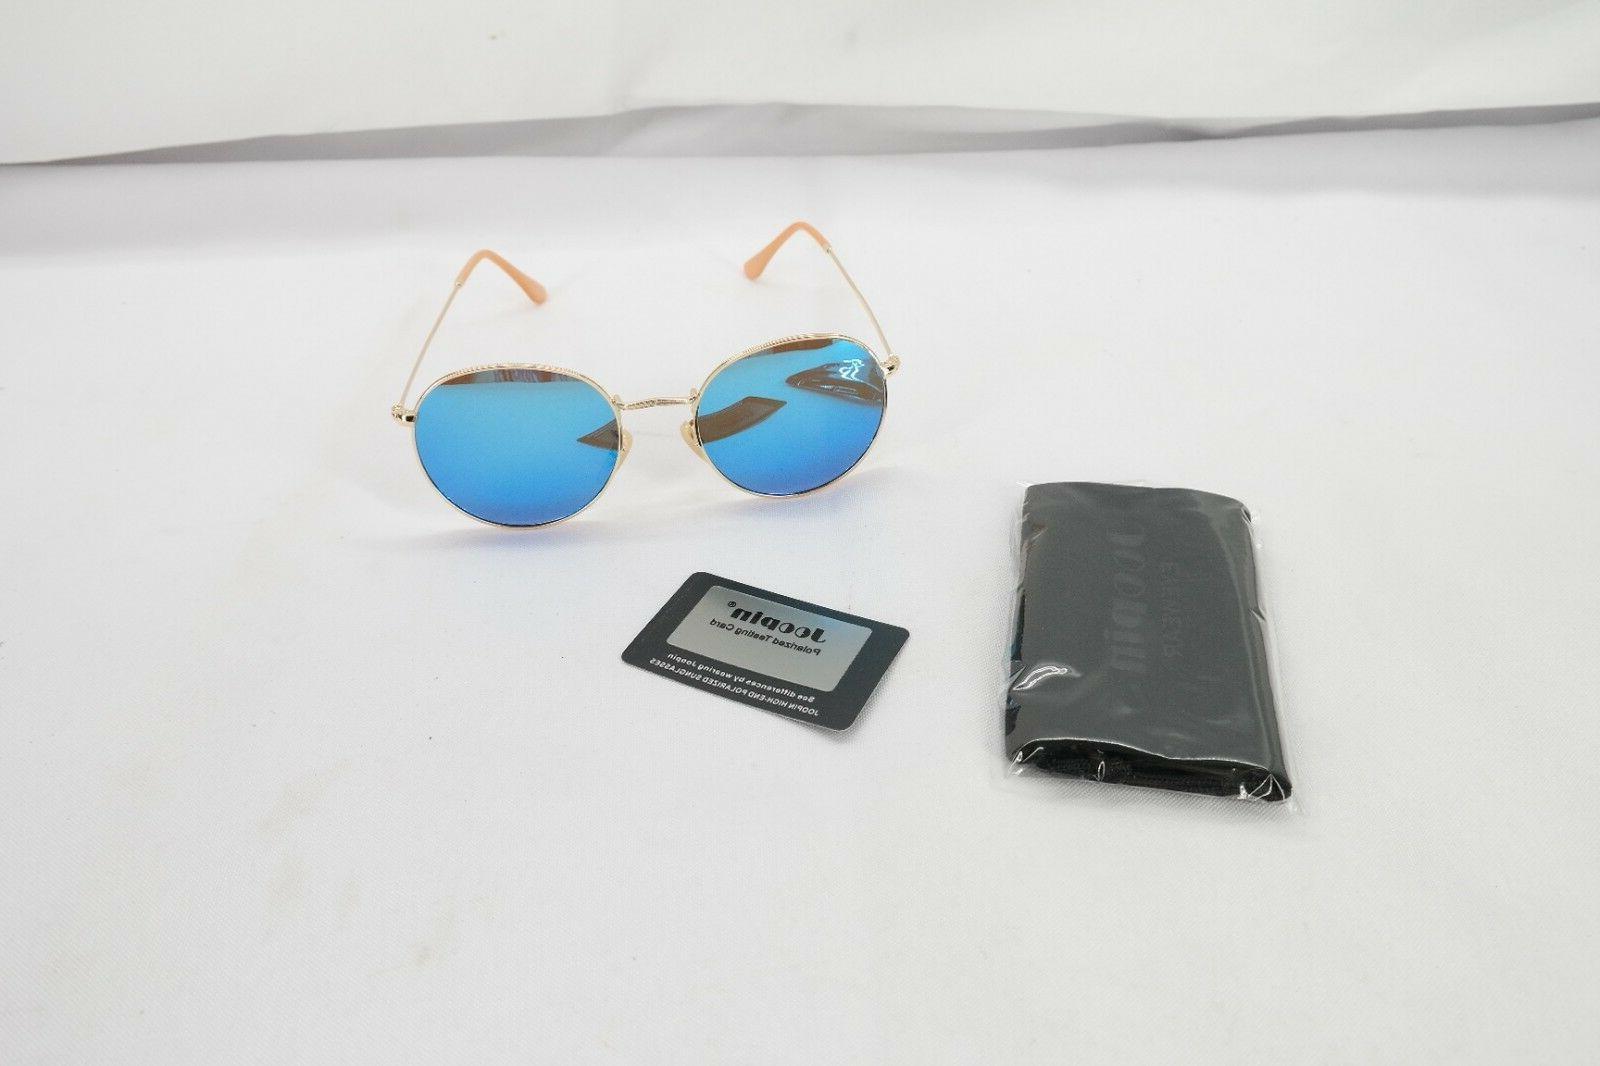 Joopin Polarized Lens Sun Glasses Vintage Round